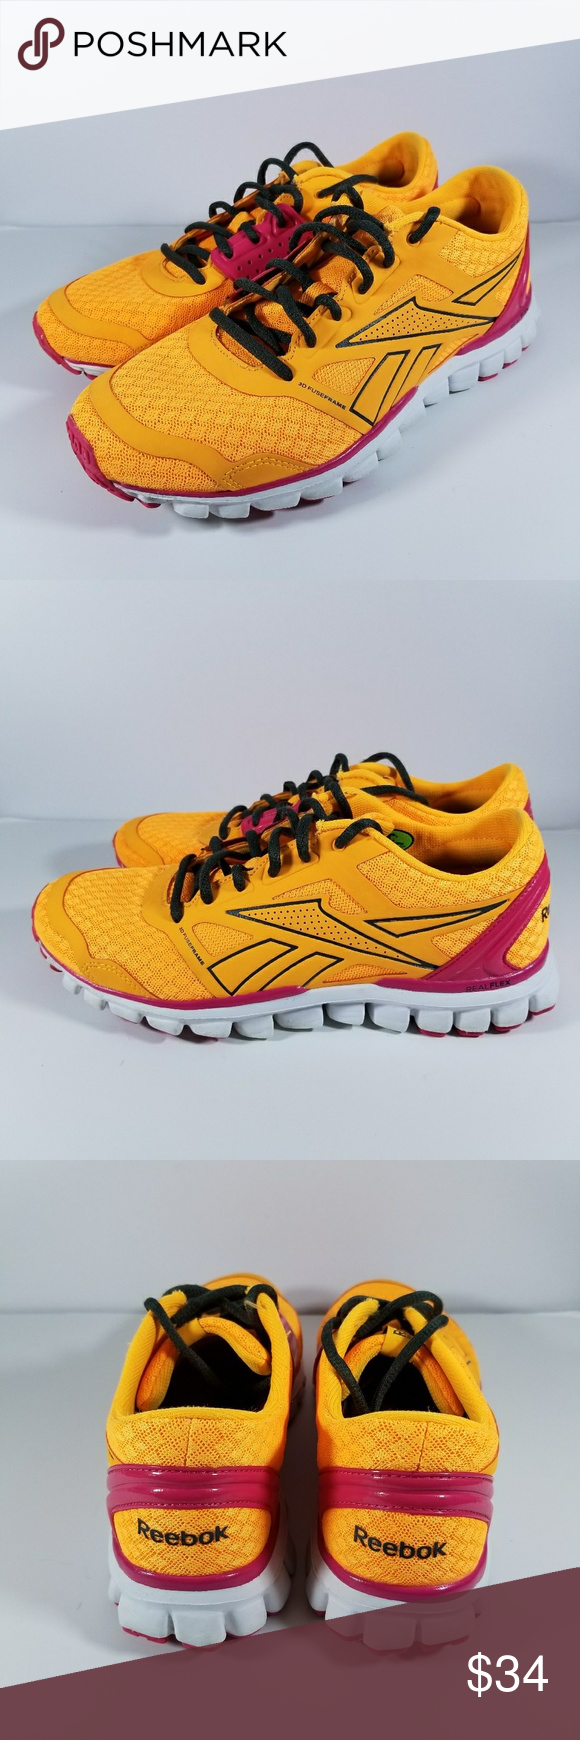 Reebok RealFlex 4 running shoes stepping around yellow